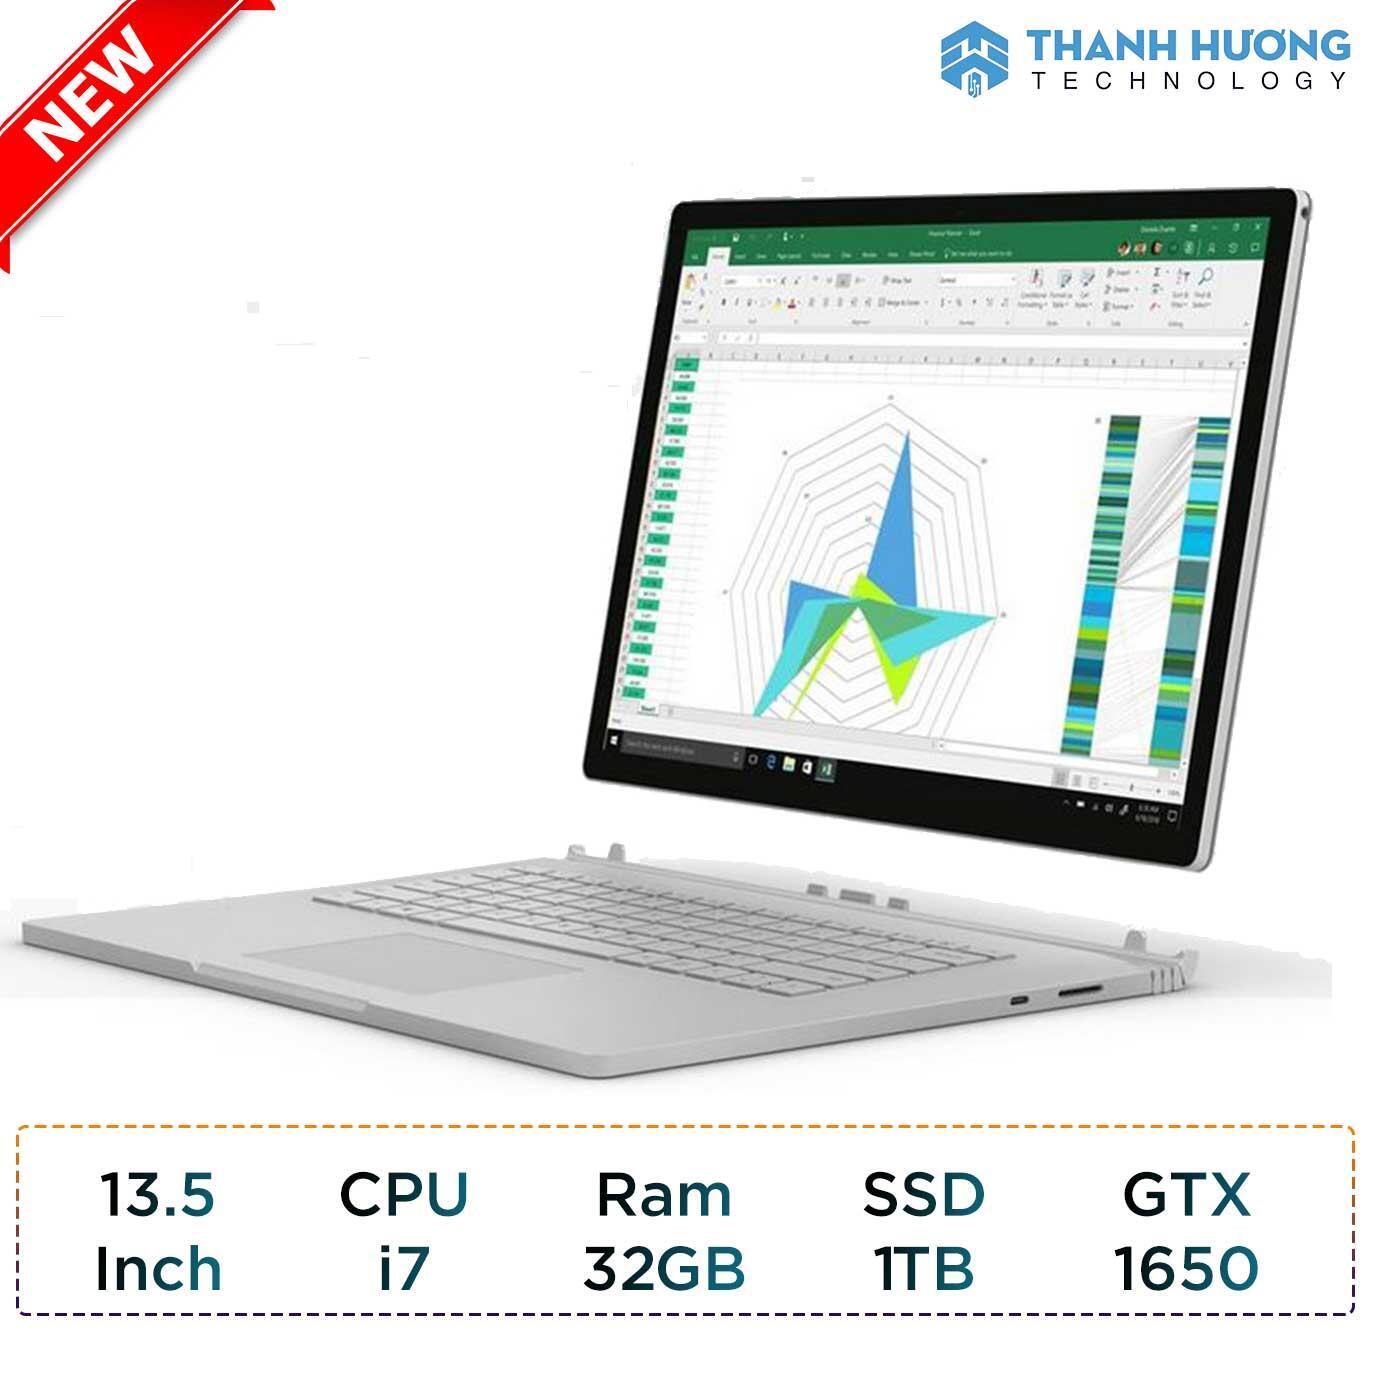 Microsoft Surface Book 3 - 13.5 inch - Core i7 - Ram 32GB - SSD 1TB - GTX 1650 4GB New Seal